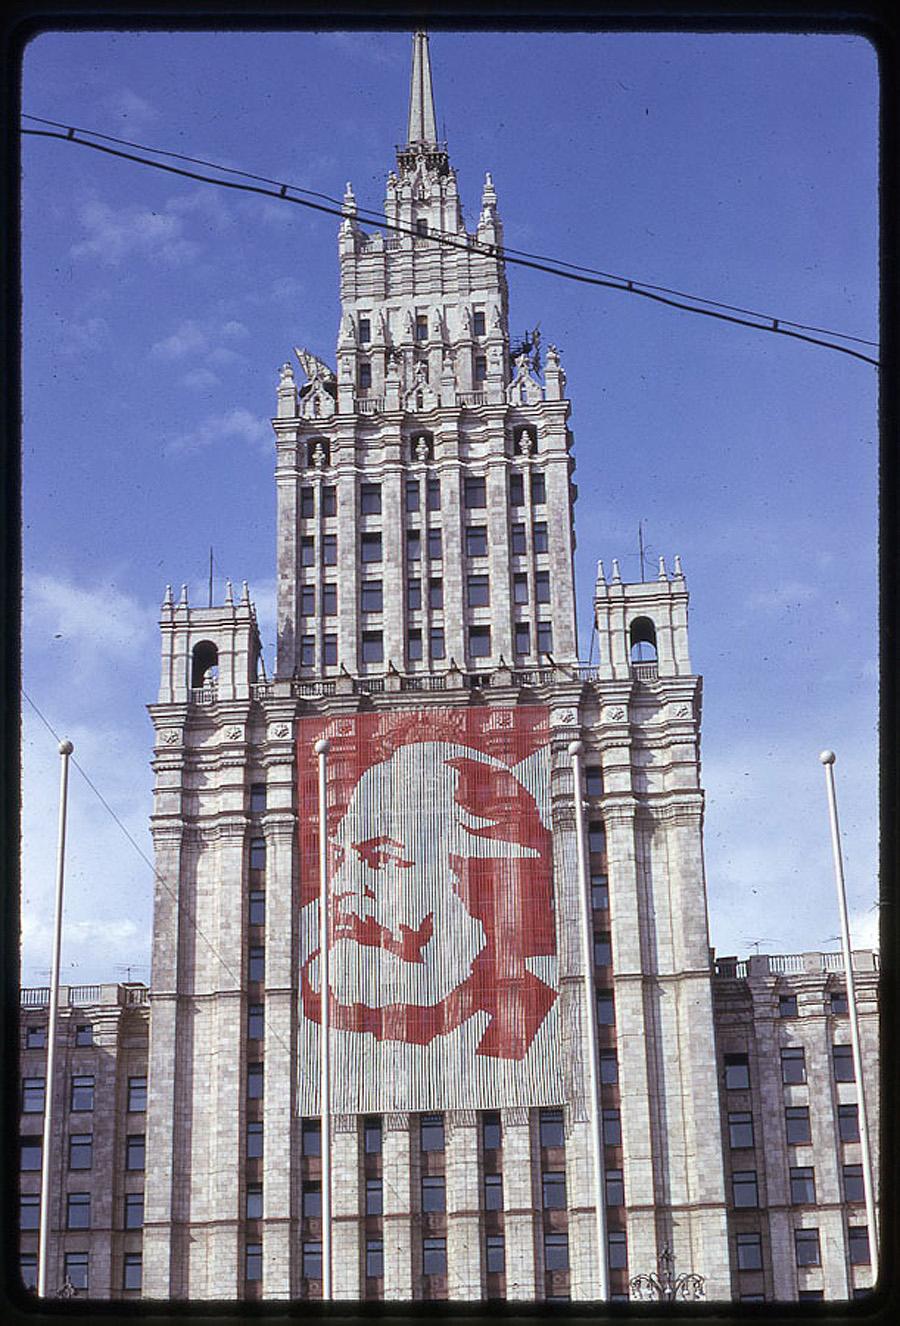 2817 Москва 1969 года в объективе американского фотографа